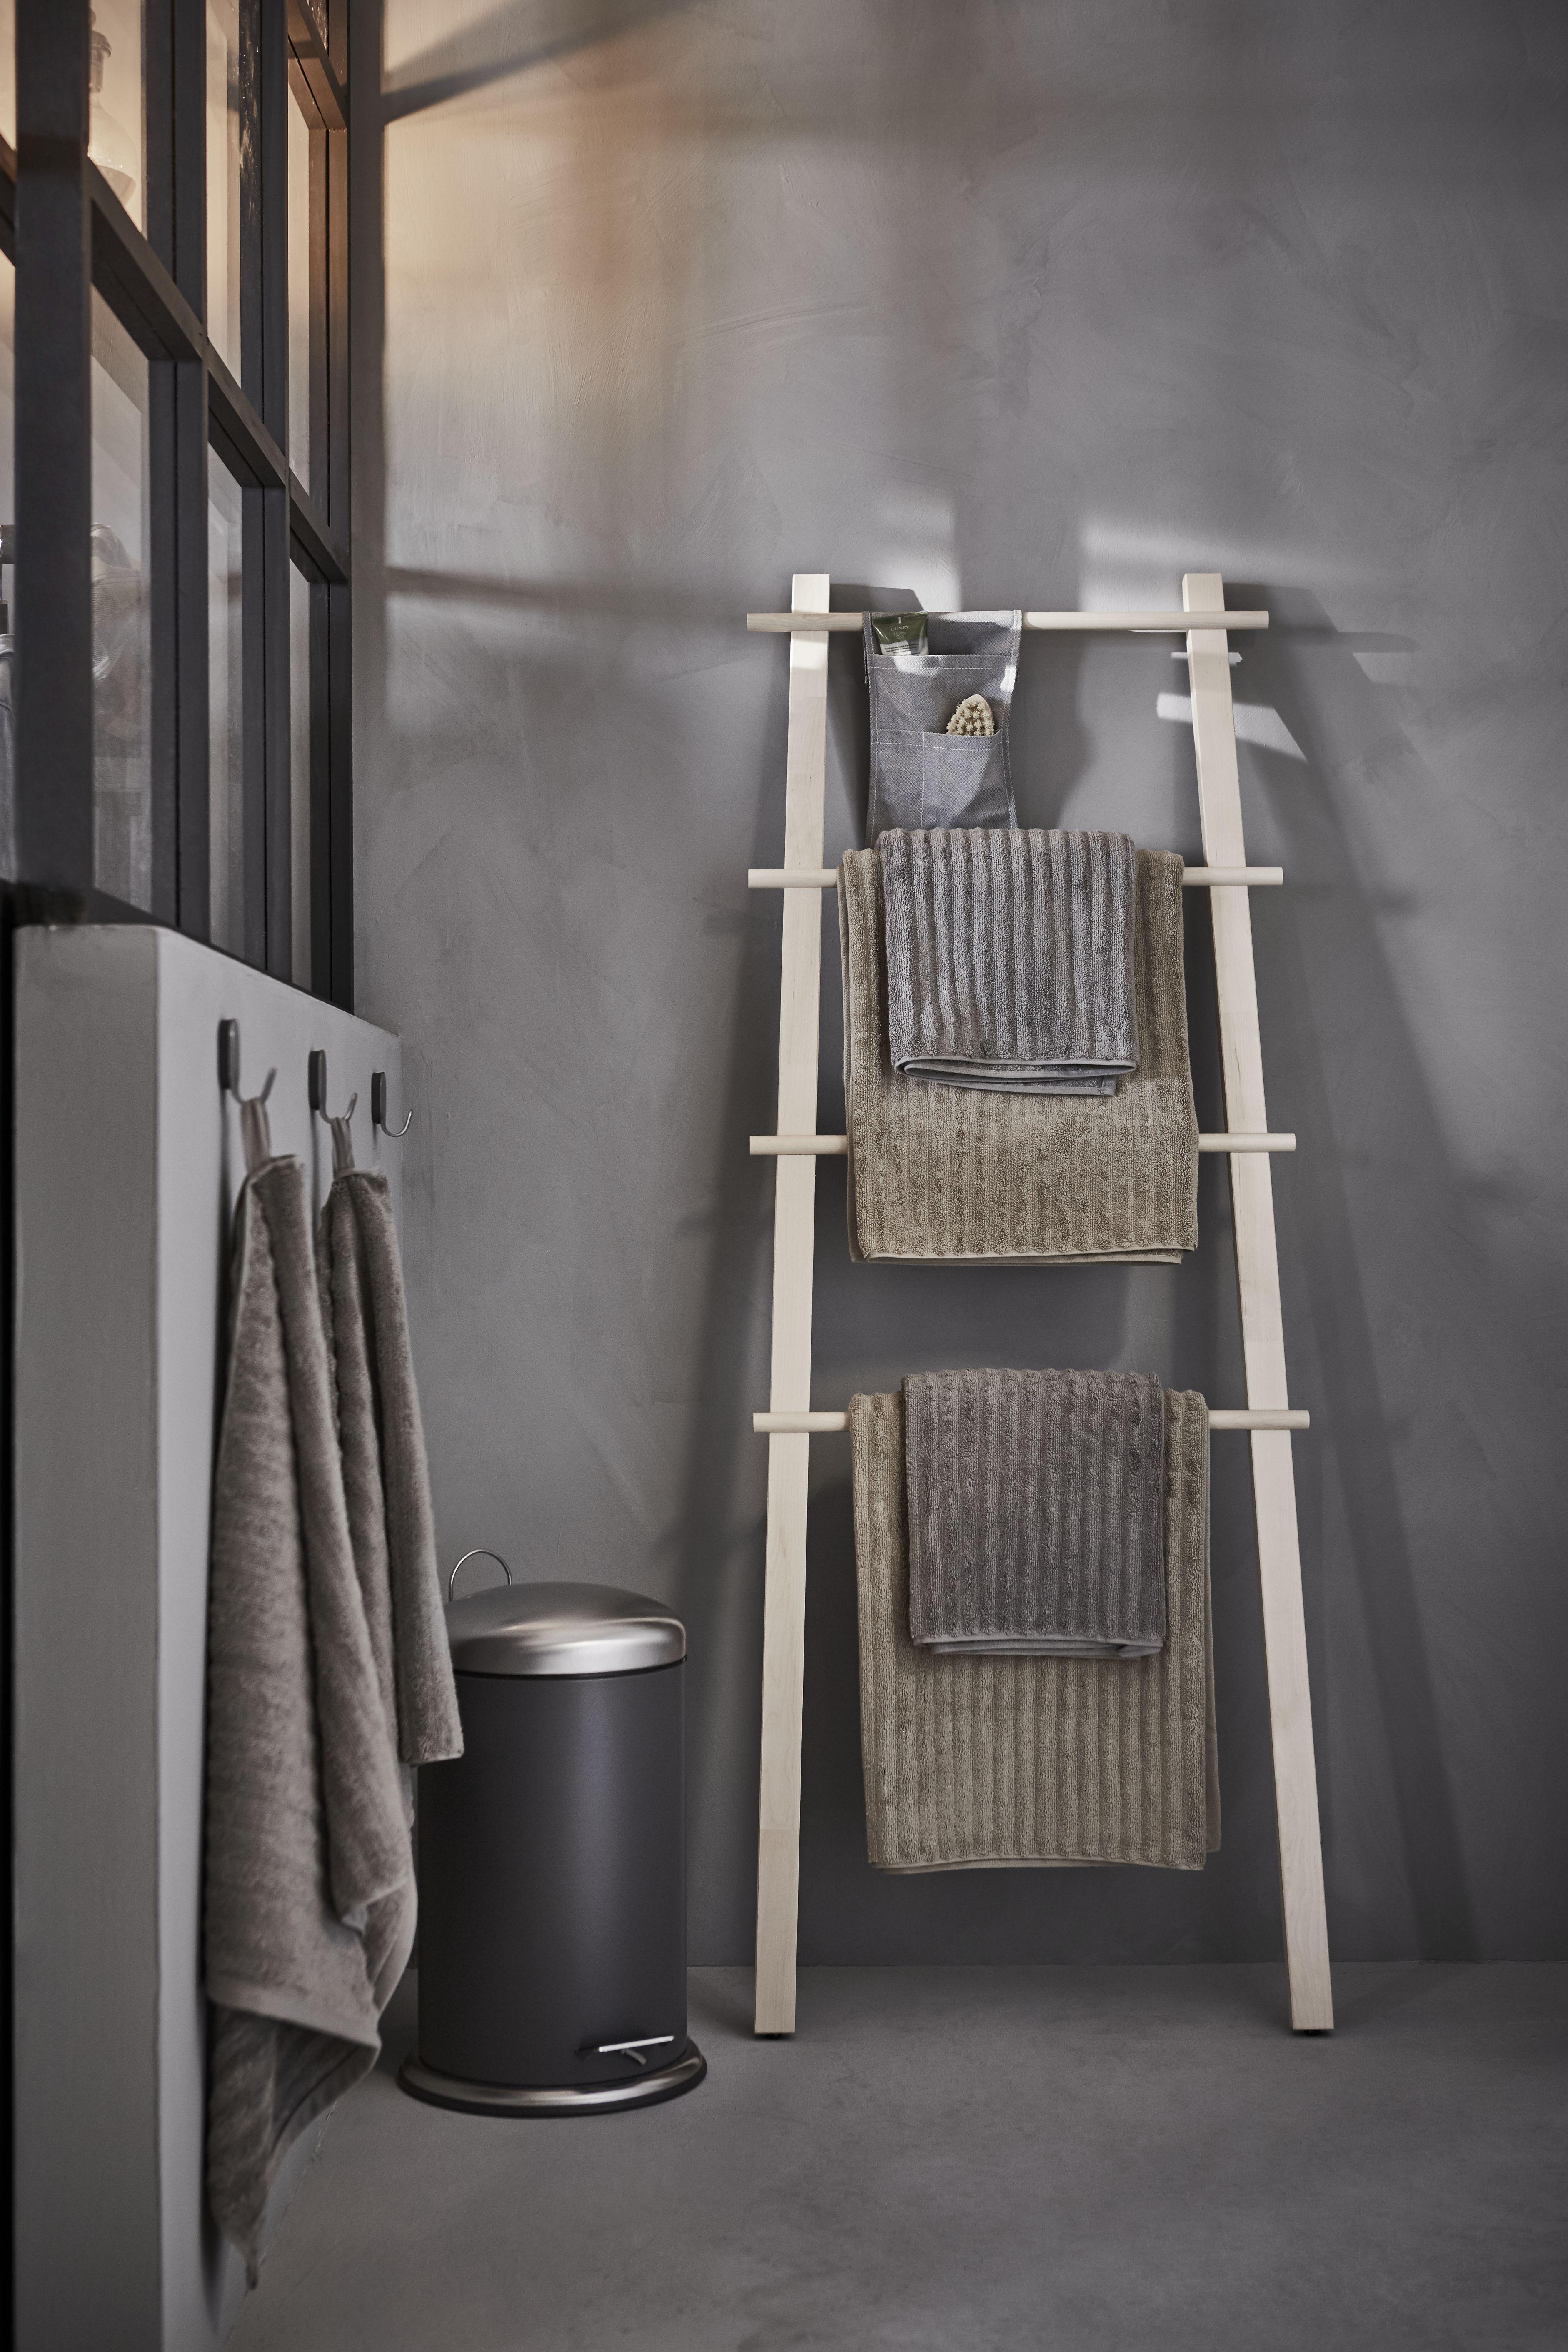 Vilto Towel Stand Birch Ikea Switzerland Ikea Bathroom Ikea Bathroom Towels